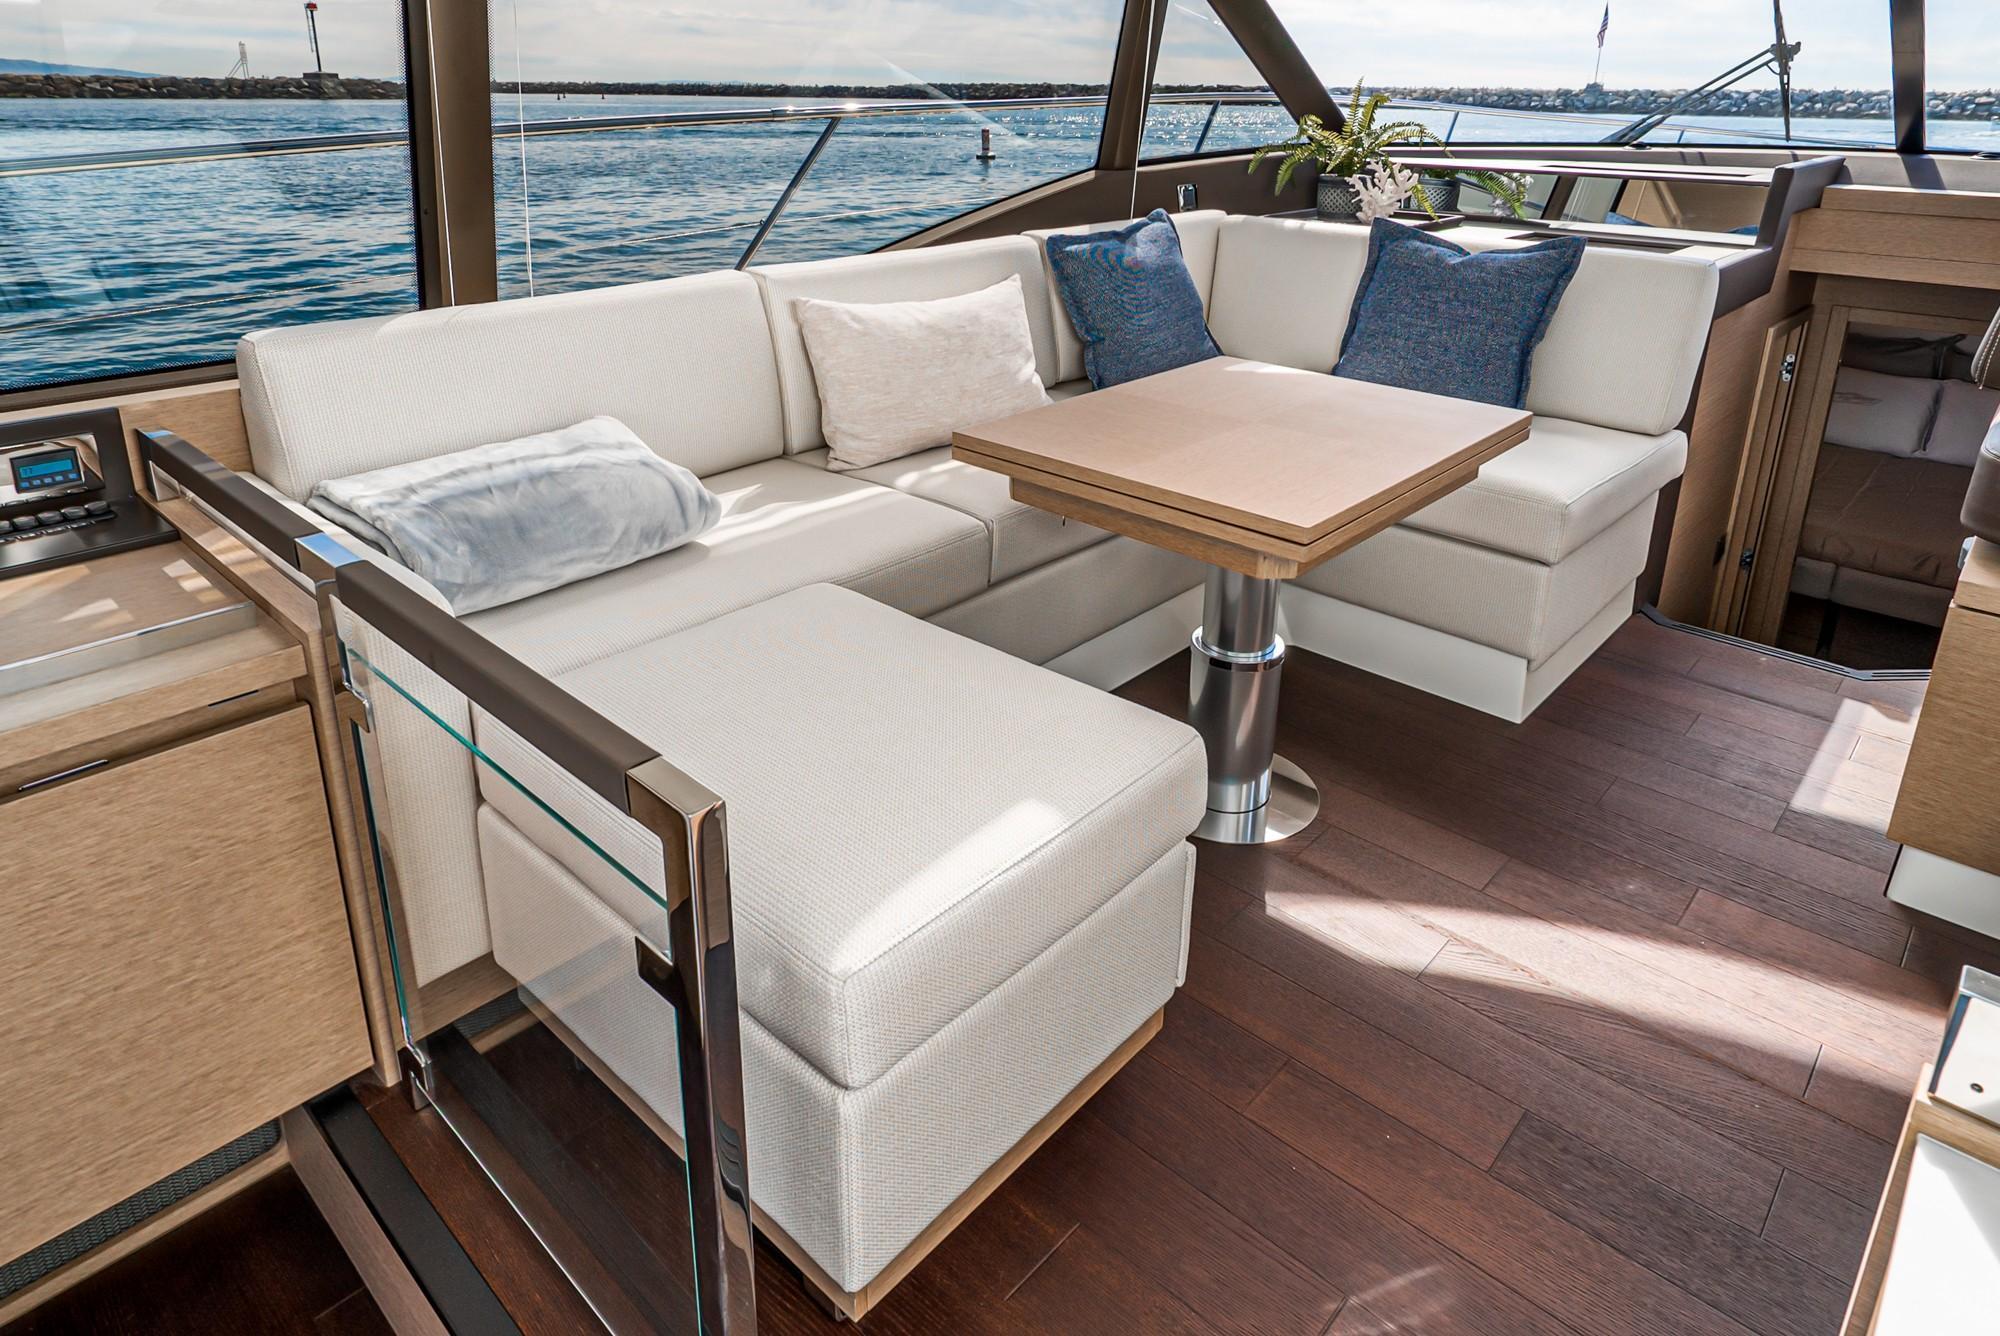 2020 Prestige 460 S #PR126L inventory image at Sun Country Coastal in Newport Beach